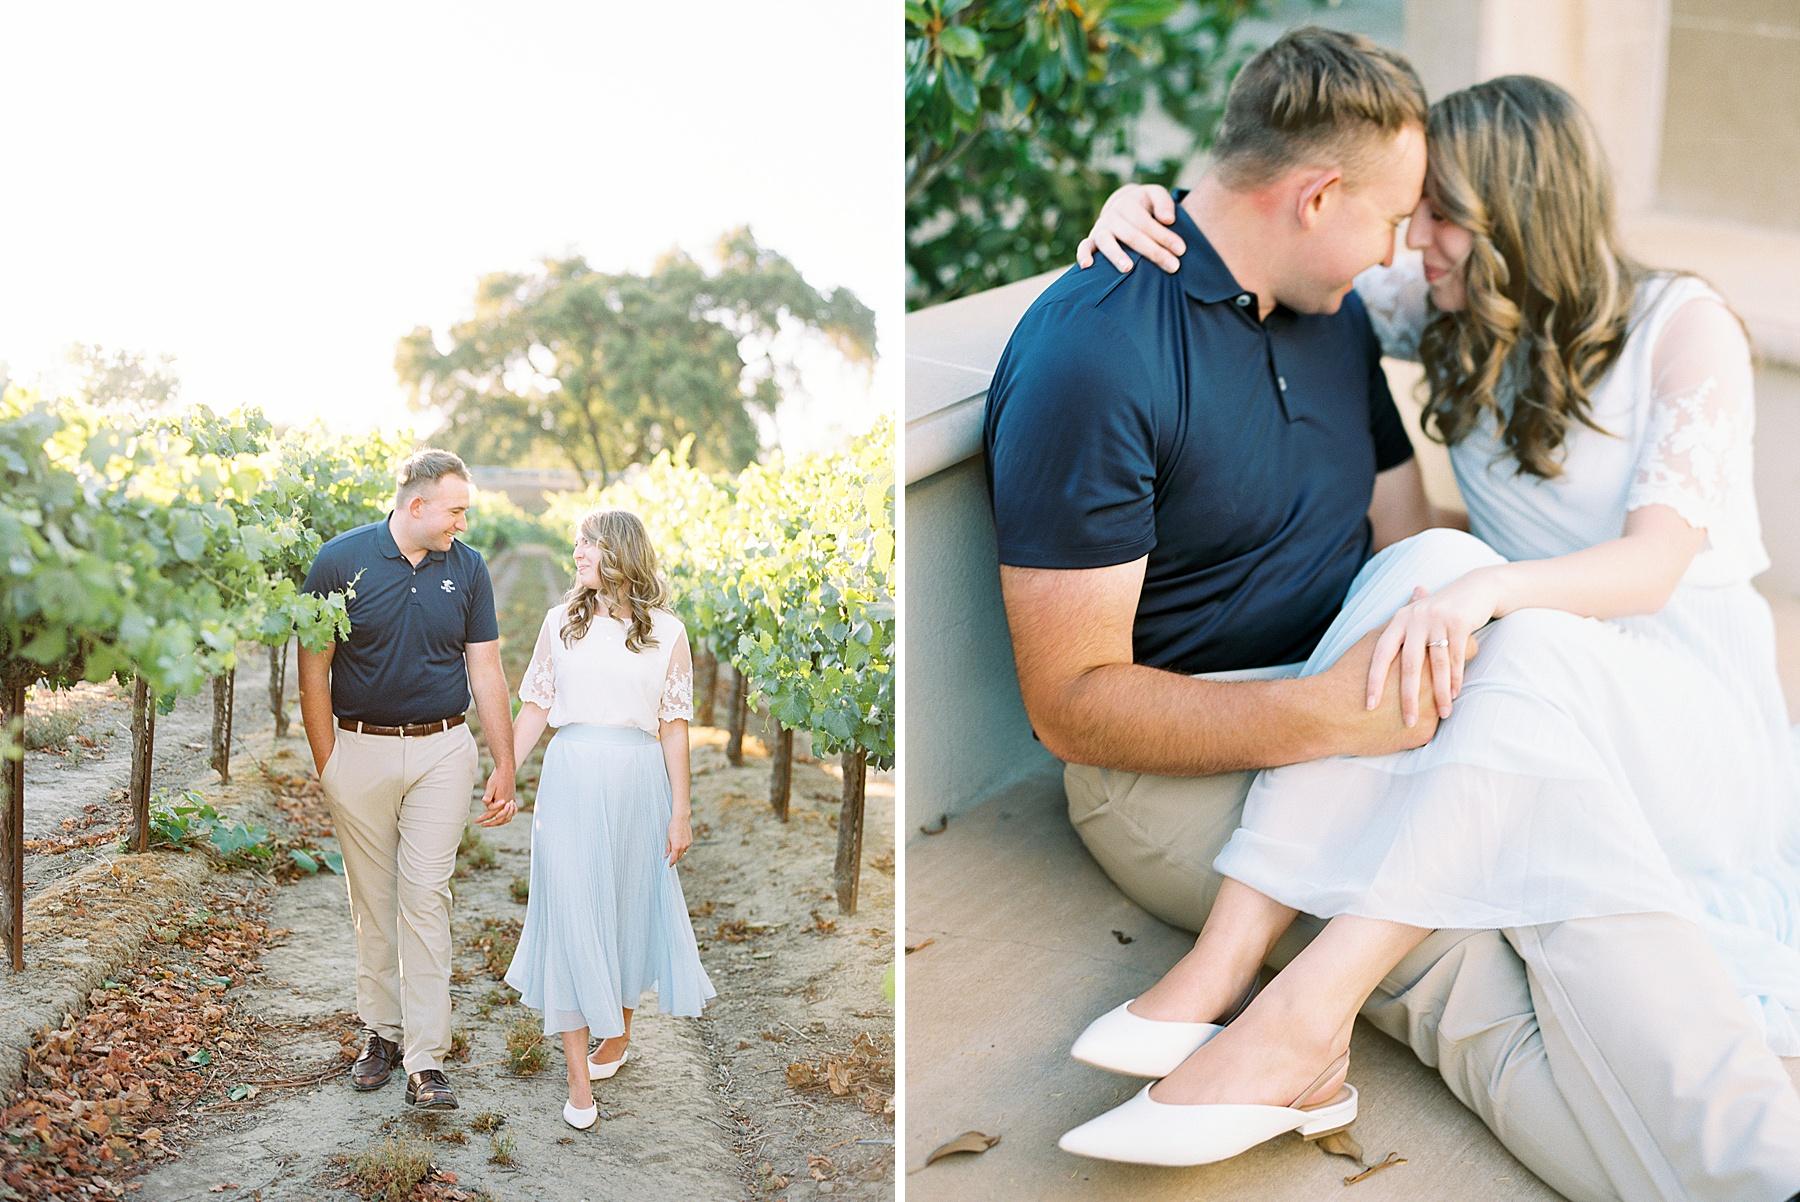 Scribner Bend Winery Engagement Session - Courtney and Steven - Ashley Baumgartner - Sribner Bend Wedding Photographer - Sacramento Wedding Photographer_0022.jpg